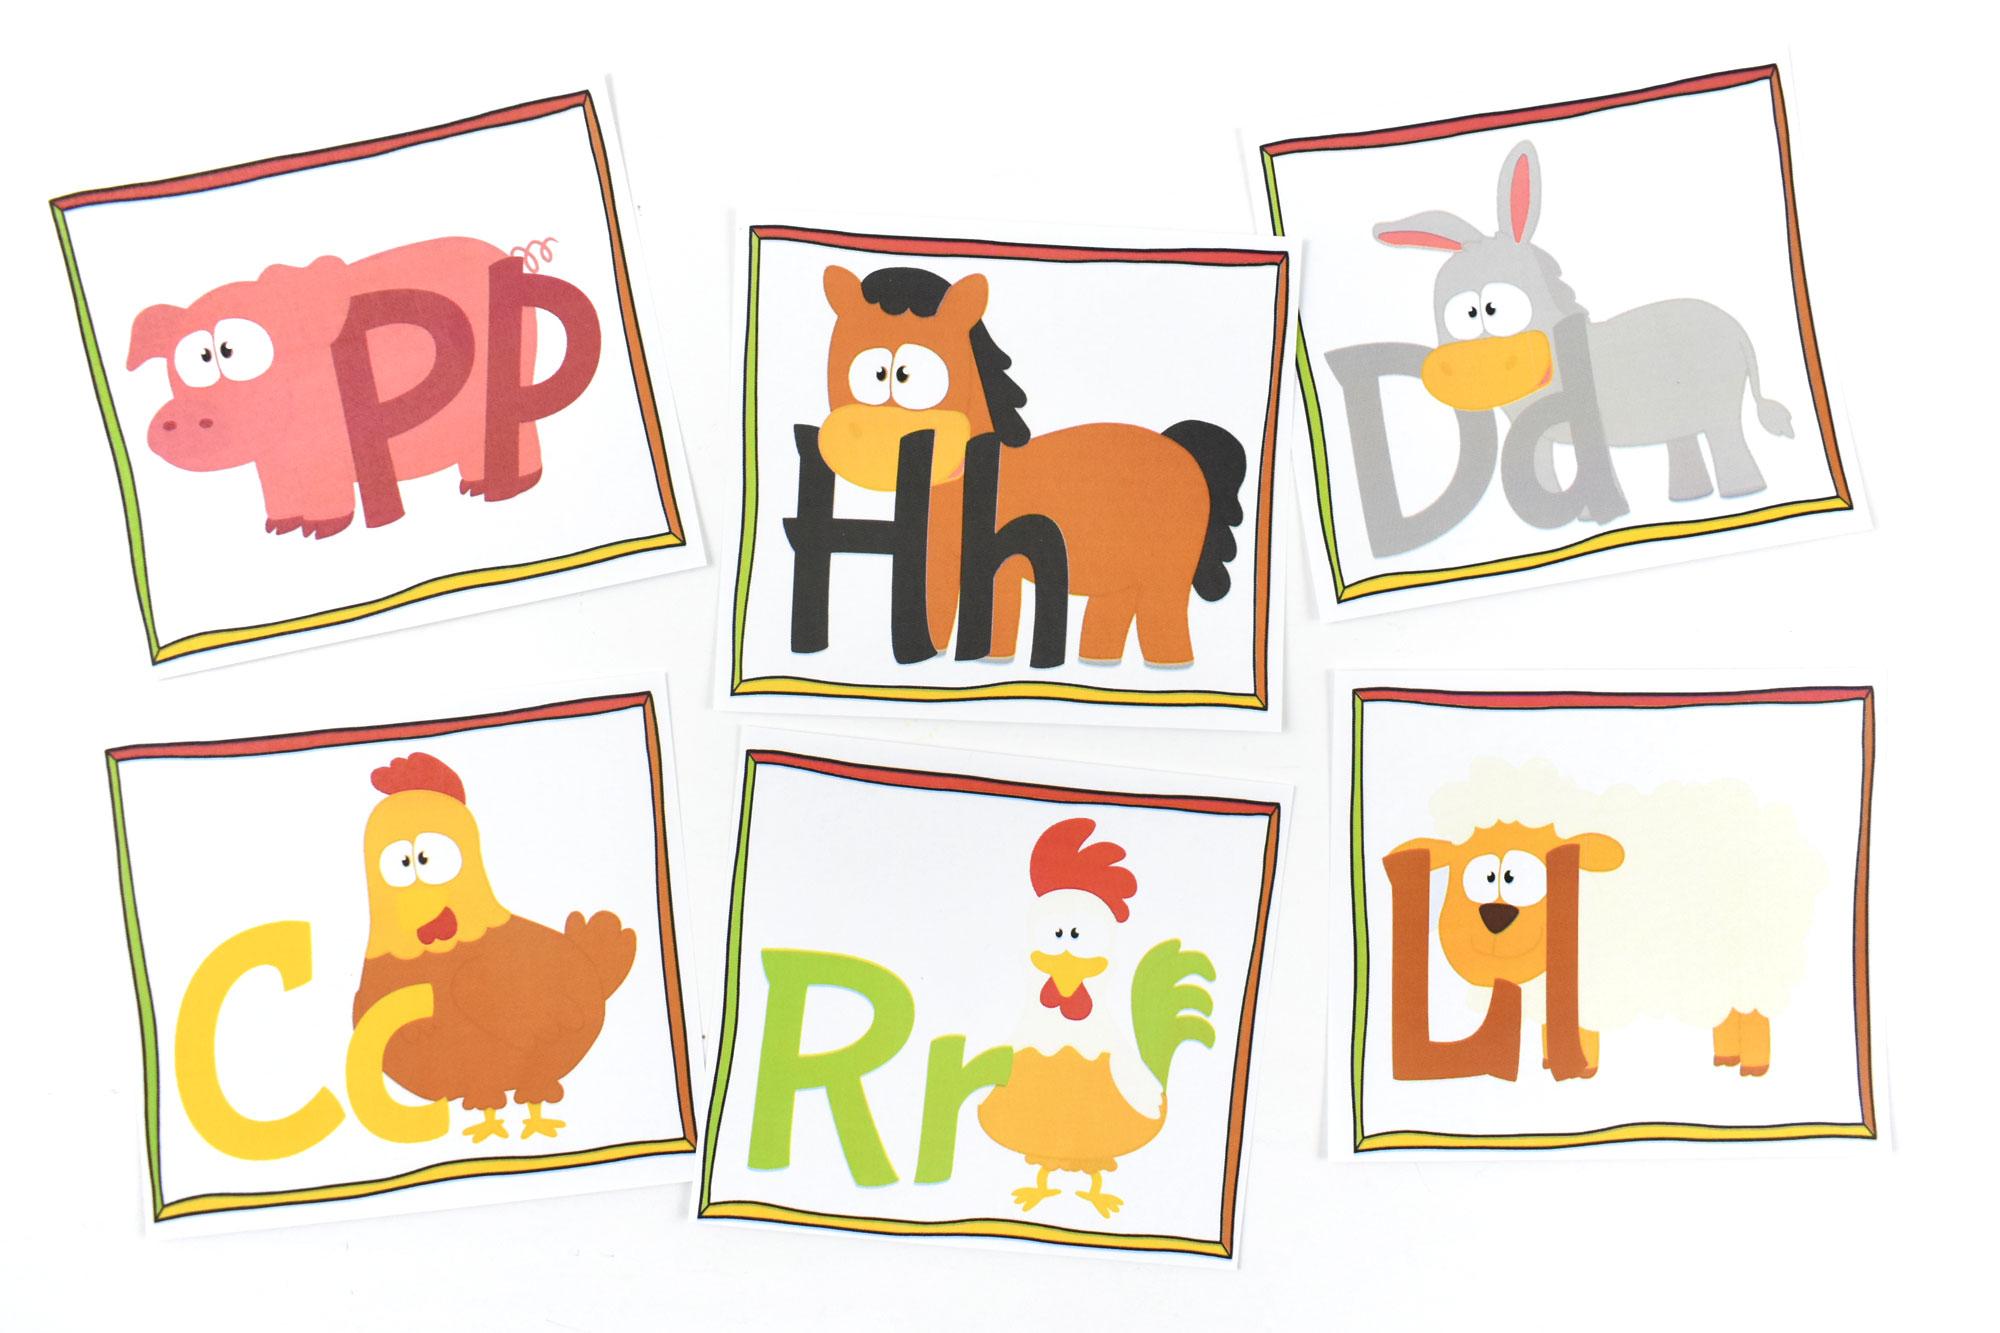 Farm Animal ABC Printable Flashcards | HolidayPrintables.net #freeprintables #abcprintables #farmanimals #farmprintables #homeschoolprintables #educationprintables #preschoolprintables #weloveprintables #holidayprintables